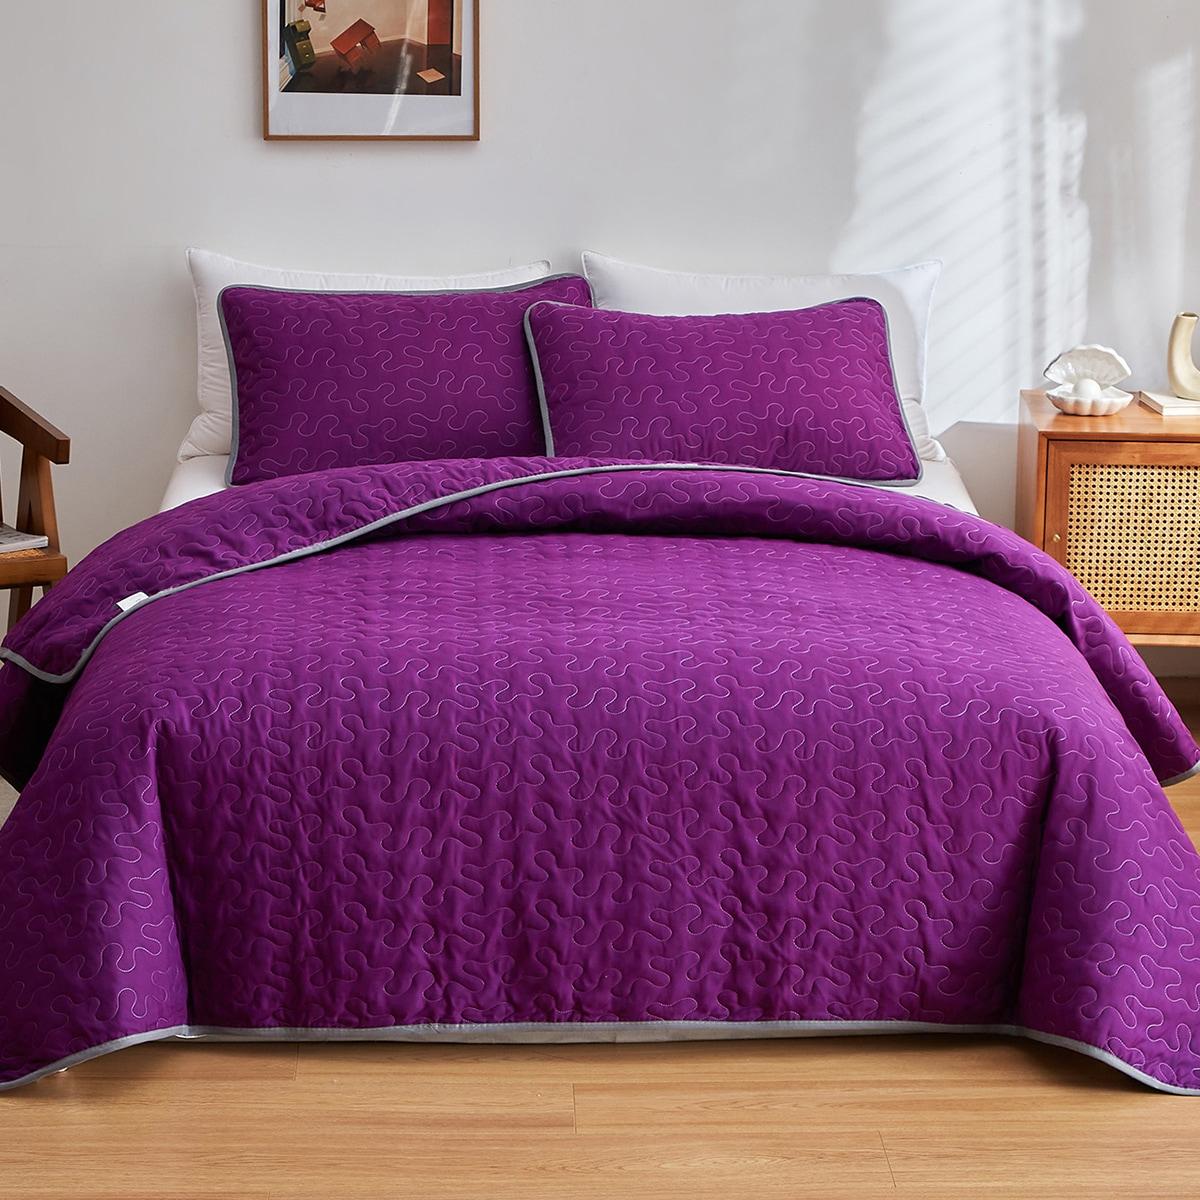 Plain Bedspread Set